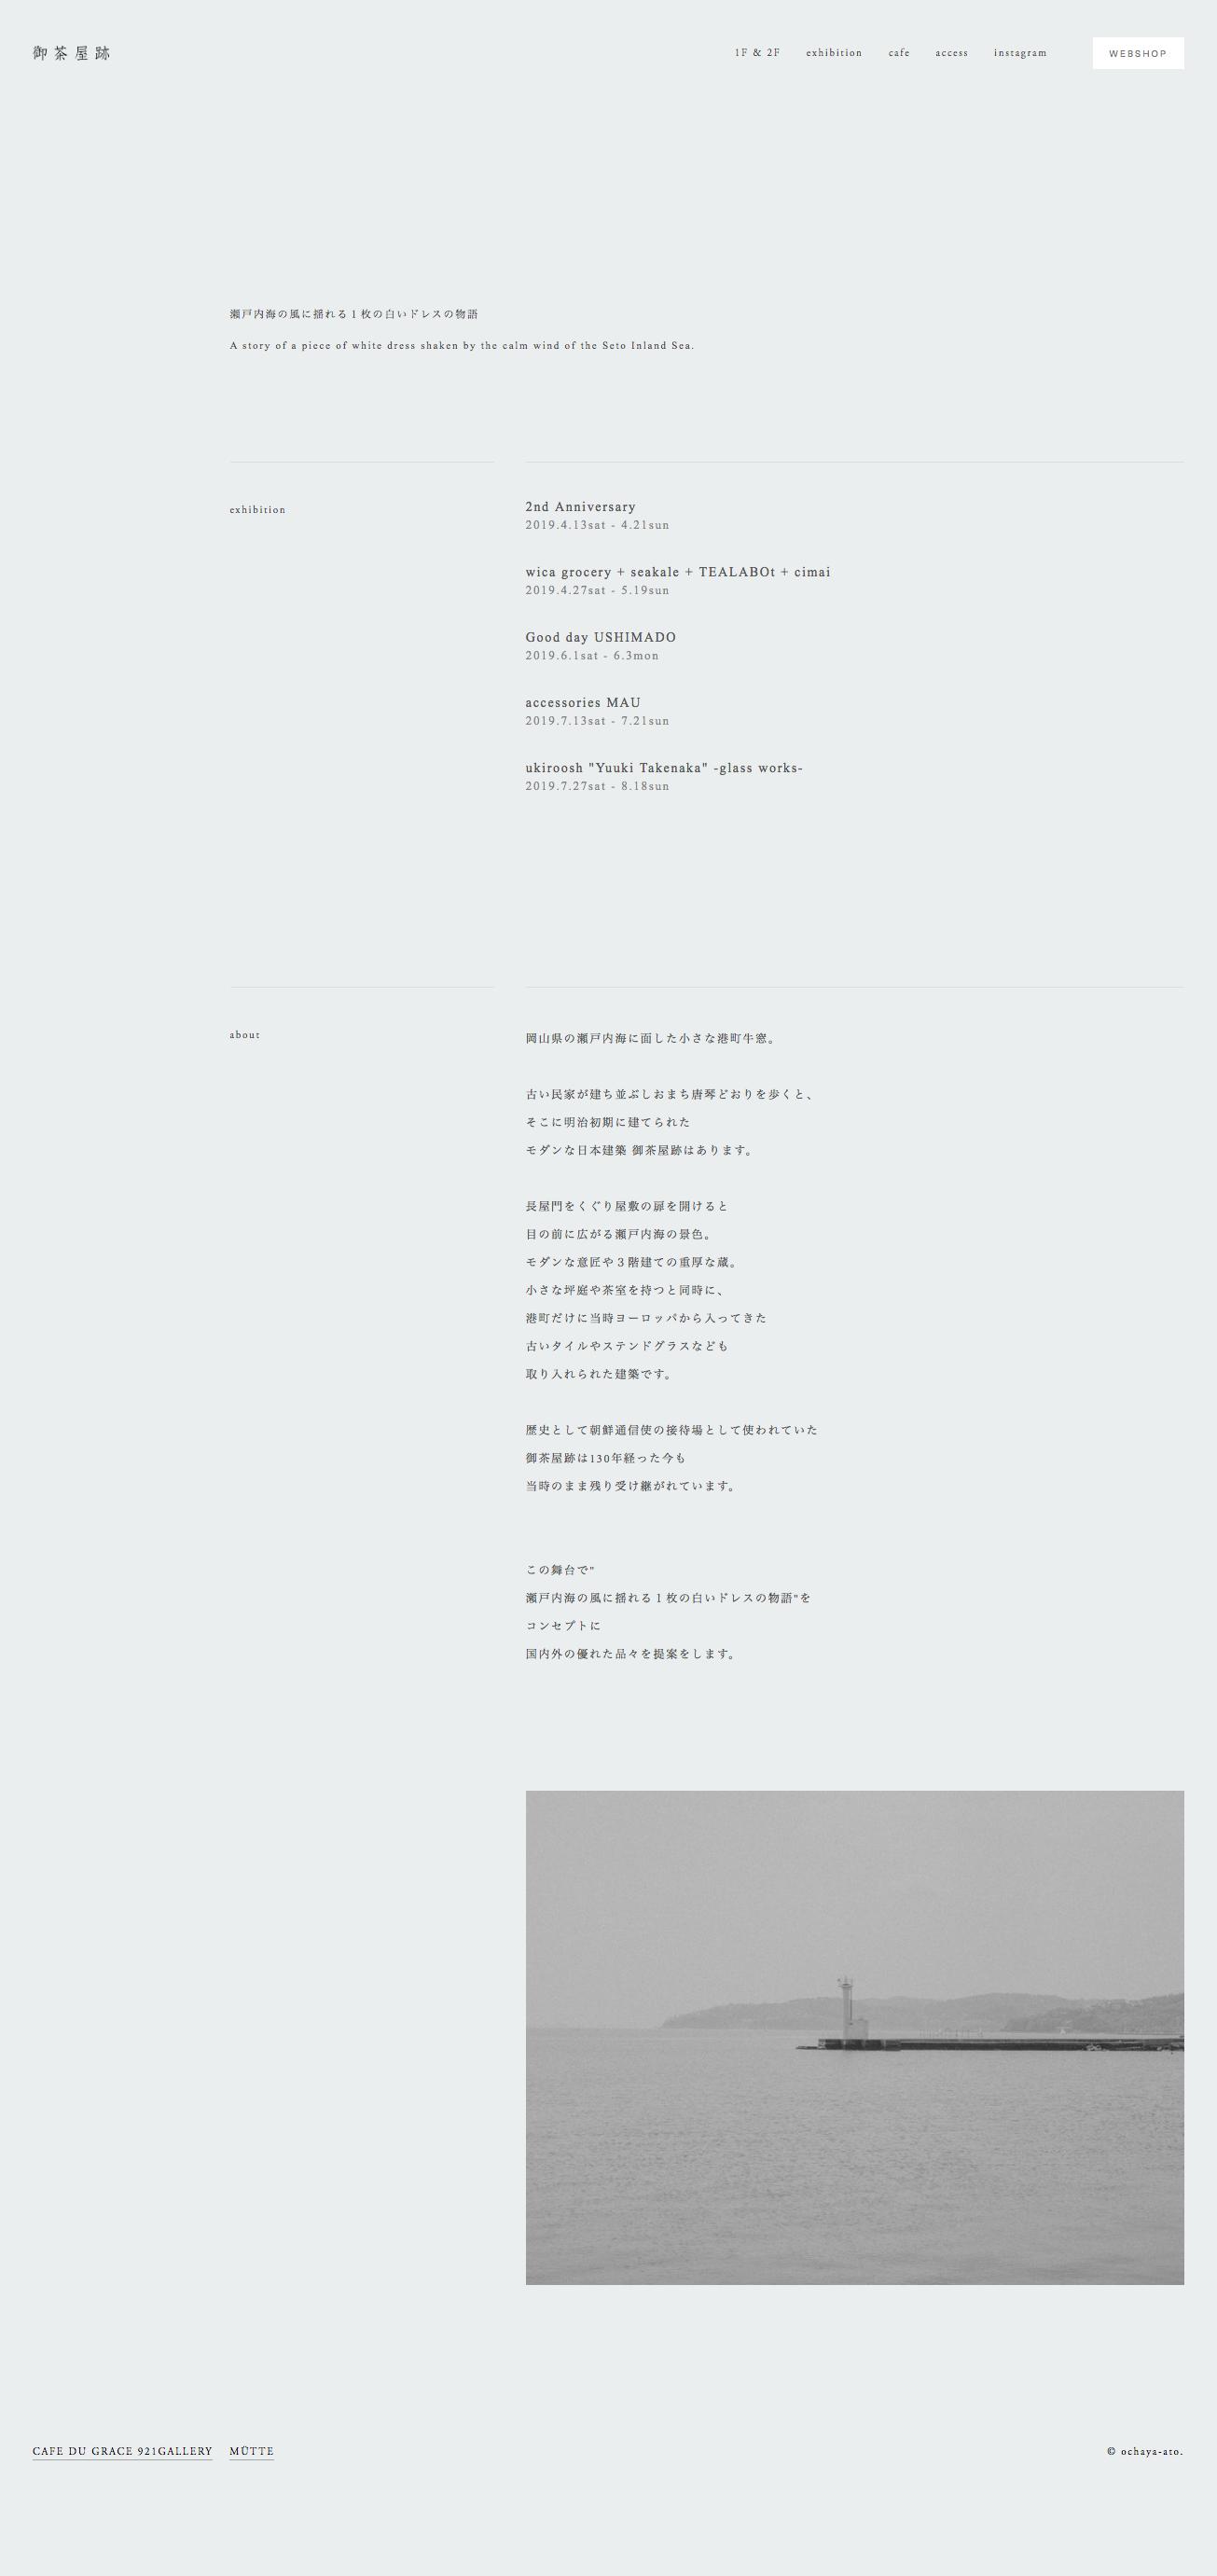 screencapture-ochaya-ato-home-2019-04-01-14_24_03.png